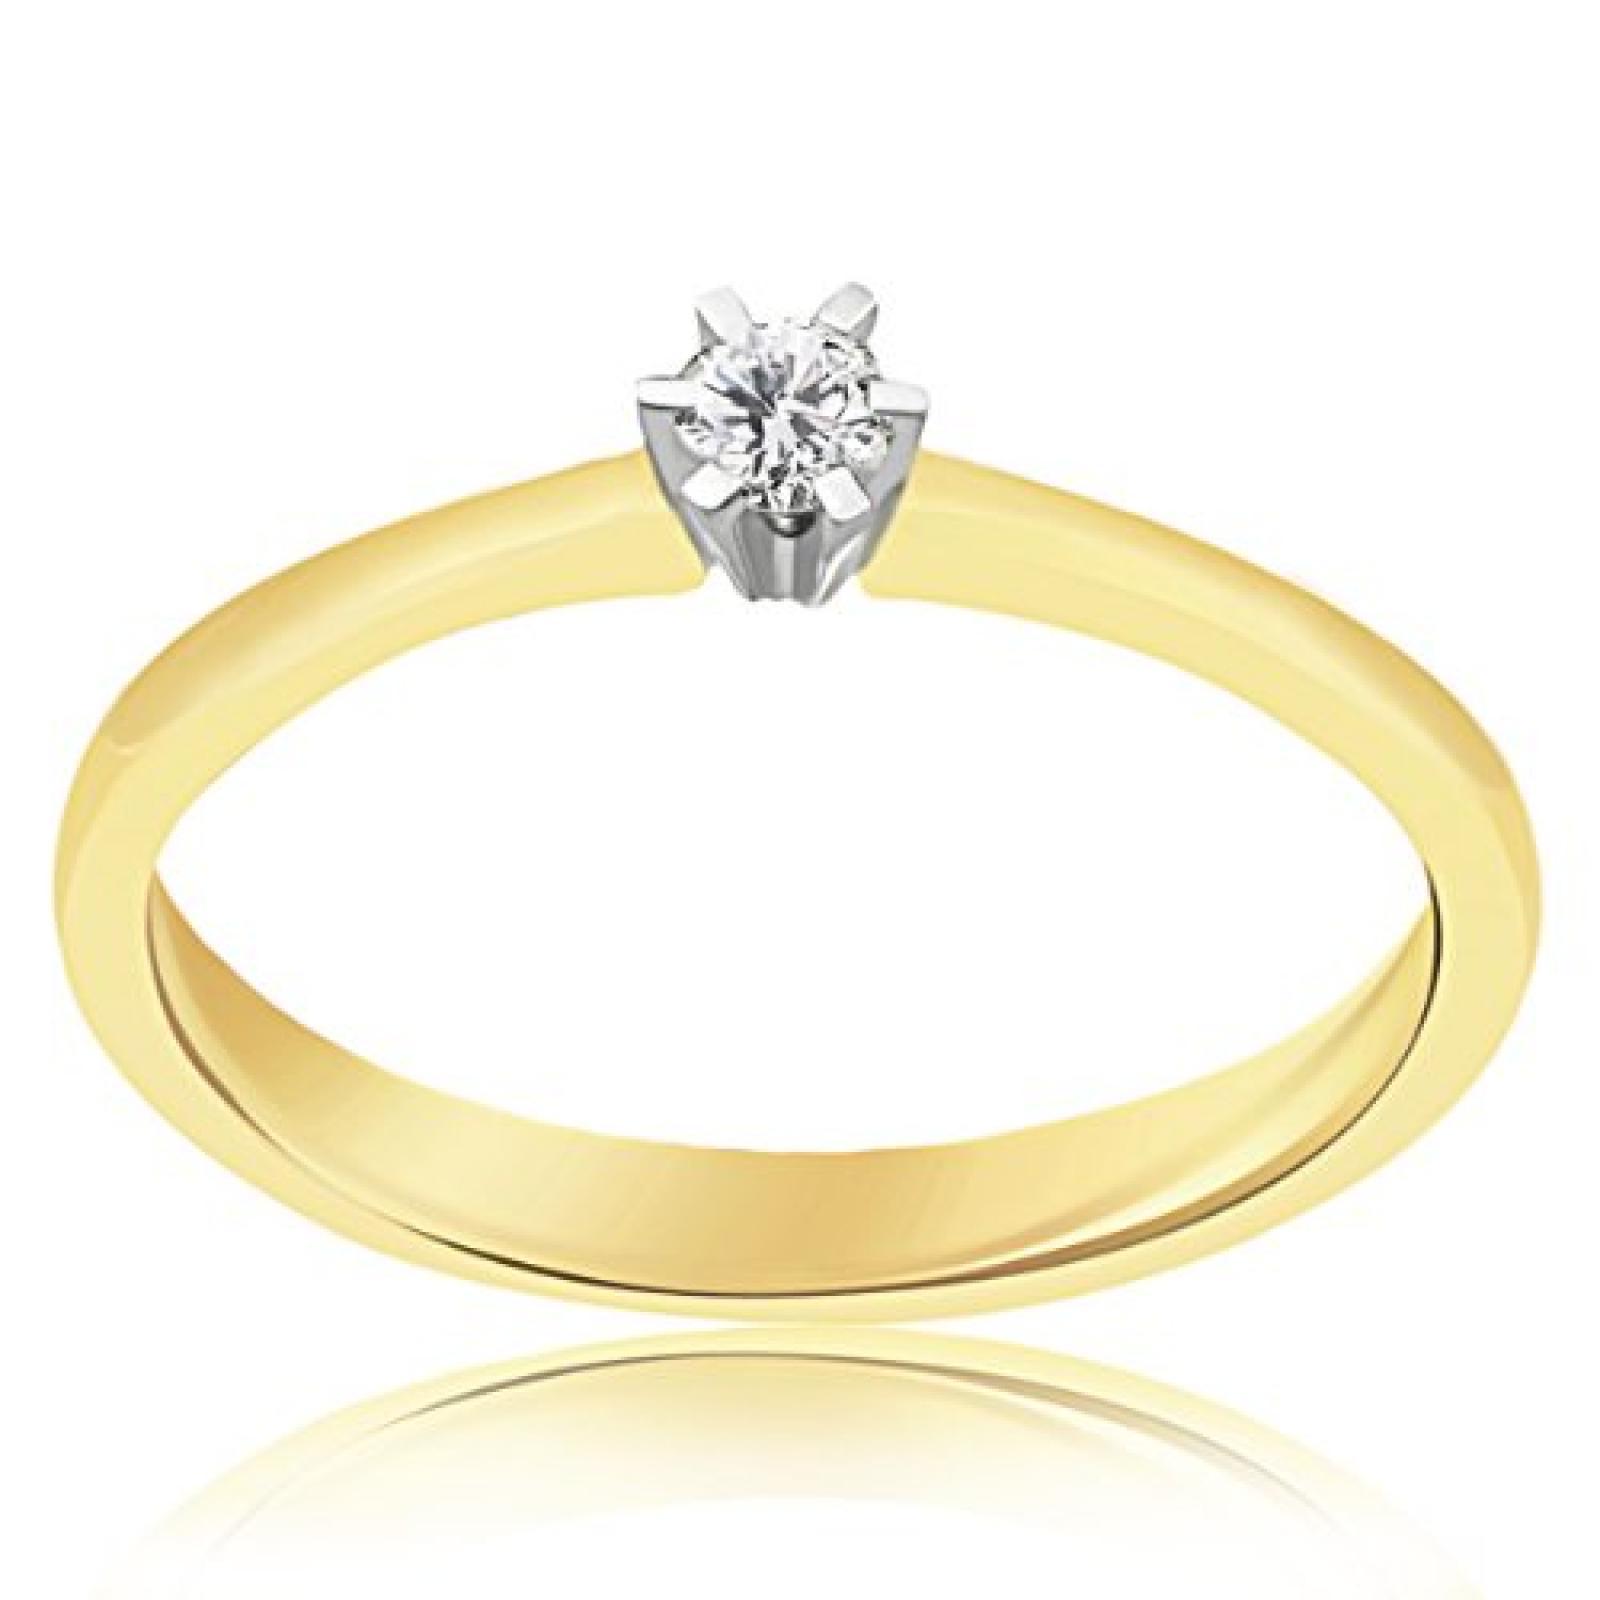 Goldmaid Damen-Ring 585 Gelbgold 1 Brillant 0,10ct So R3986GG